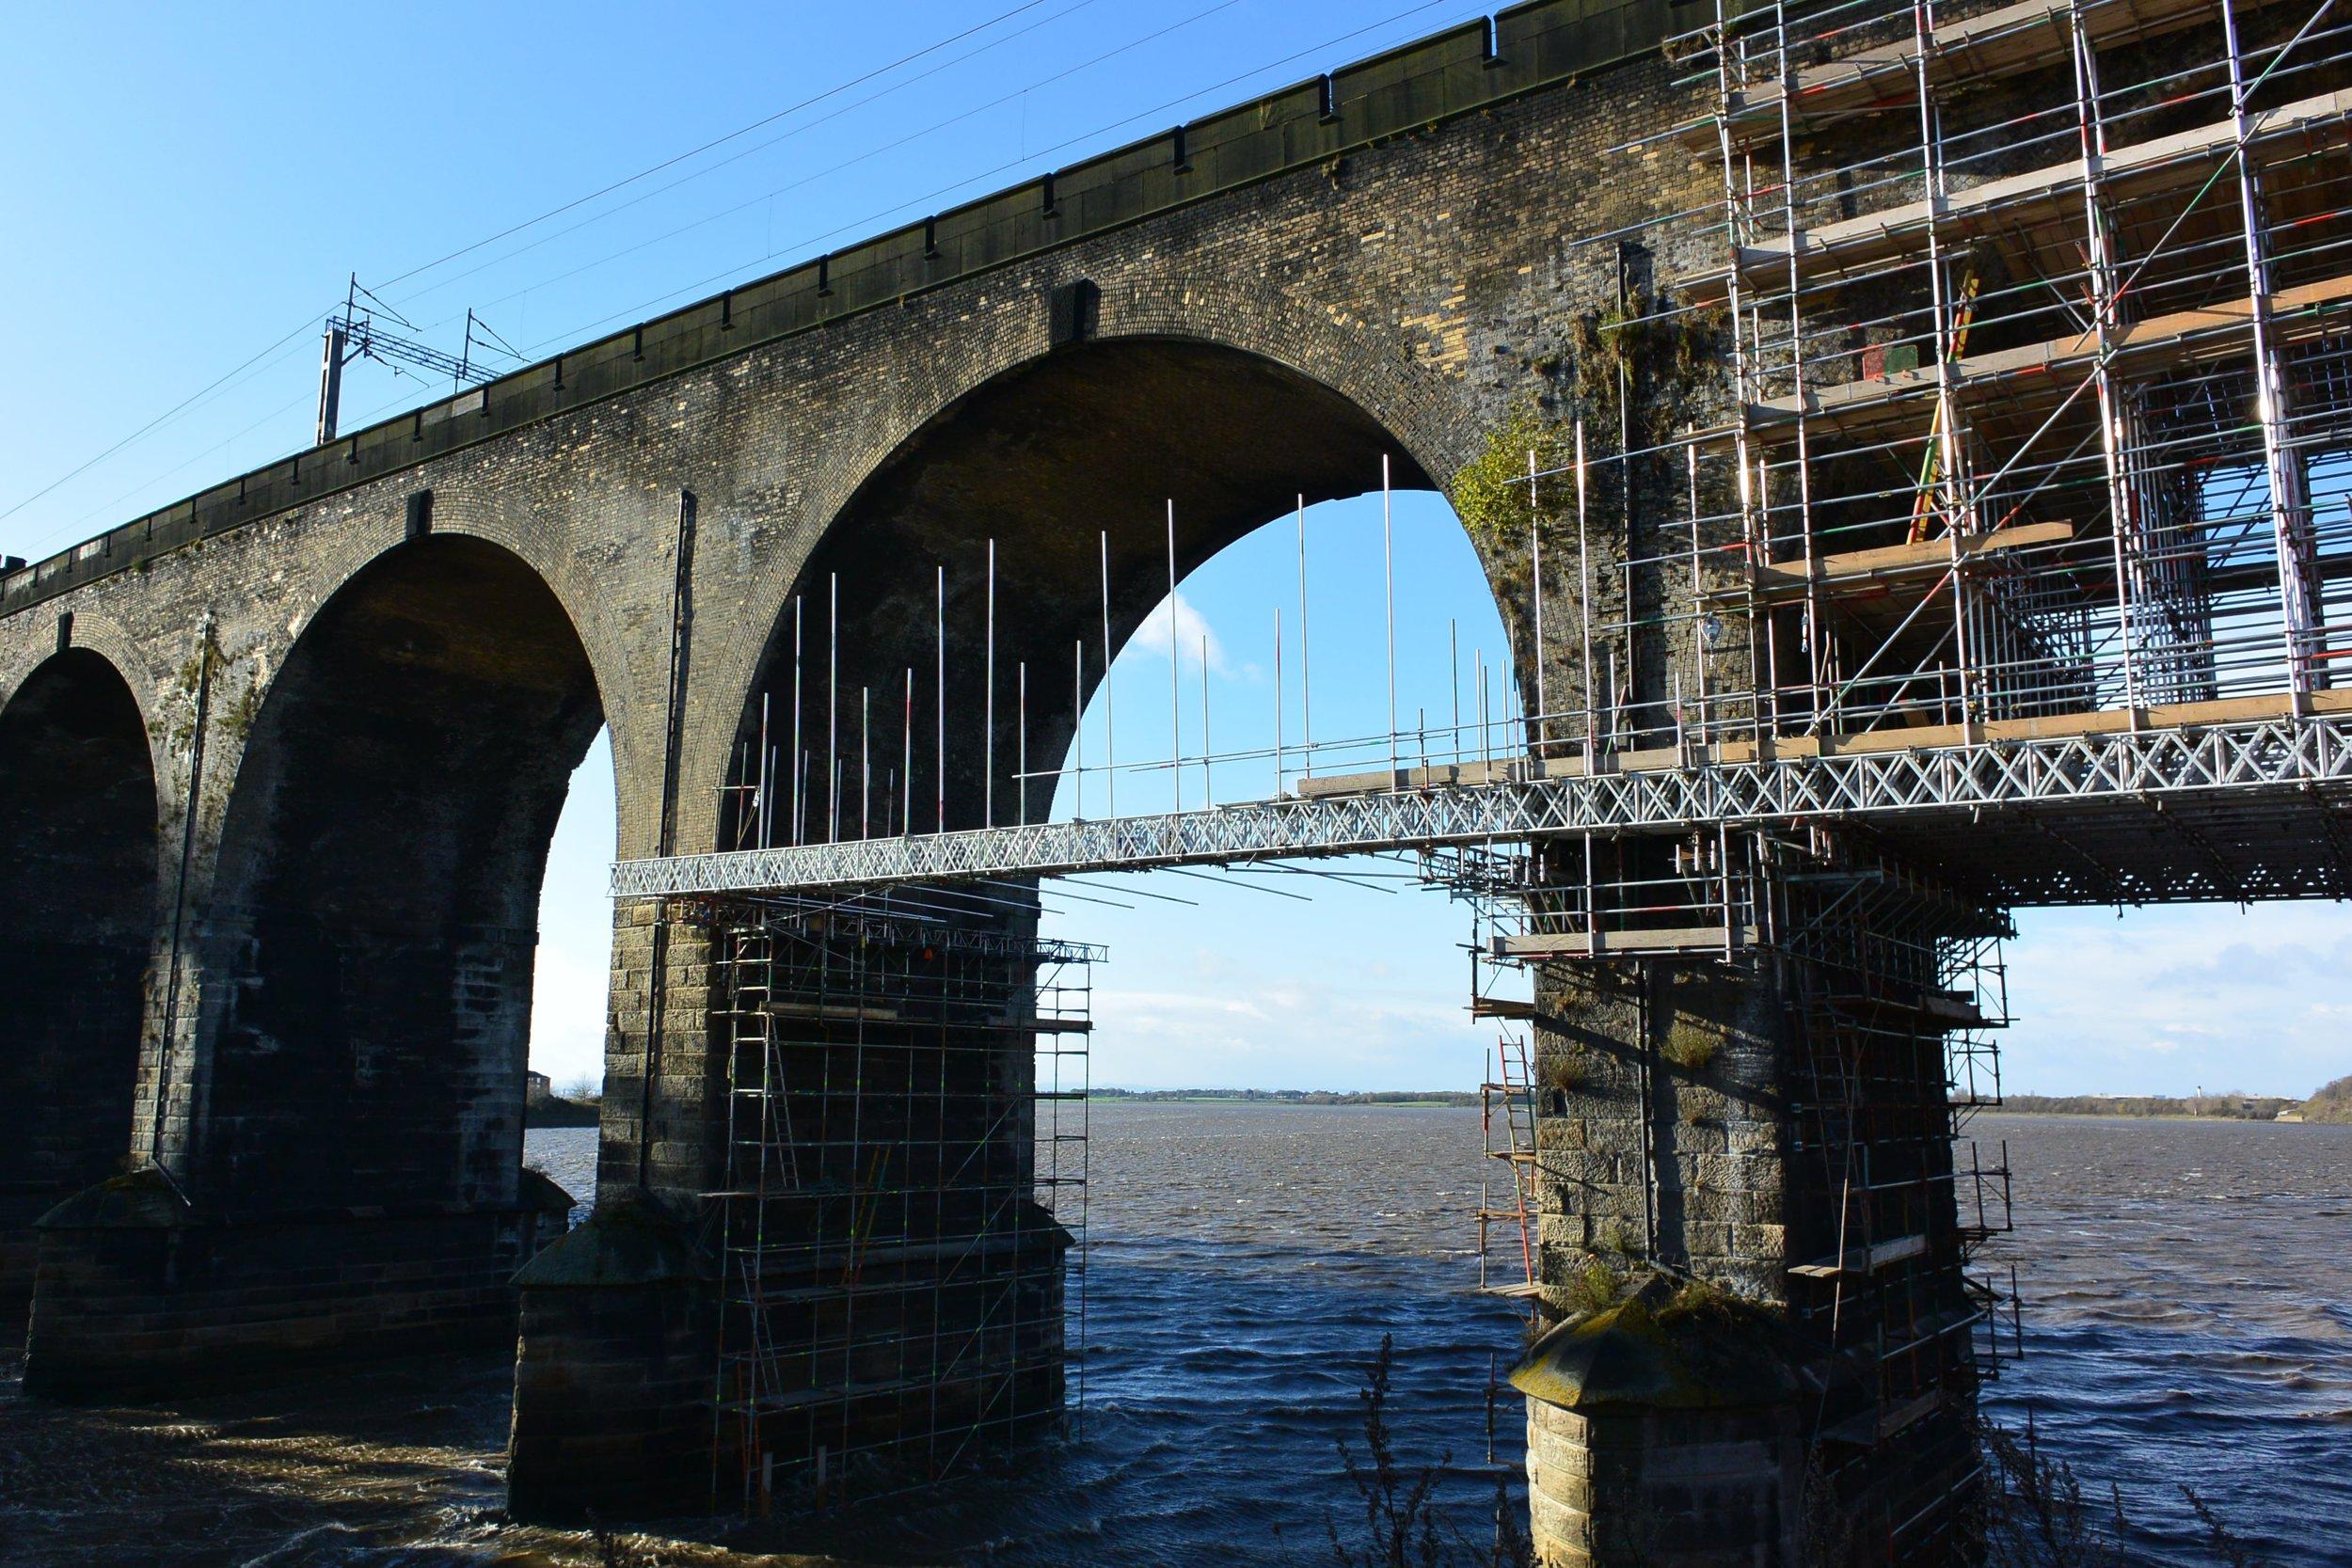 Bridged lattice beam scaffold structure spanning underneath the Runcorn Bridge